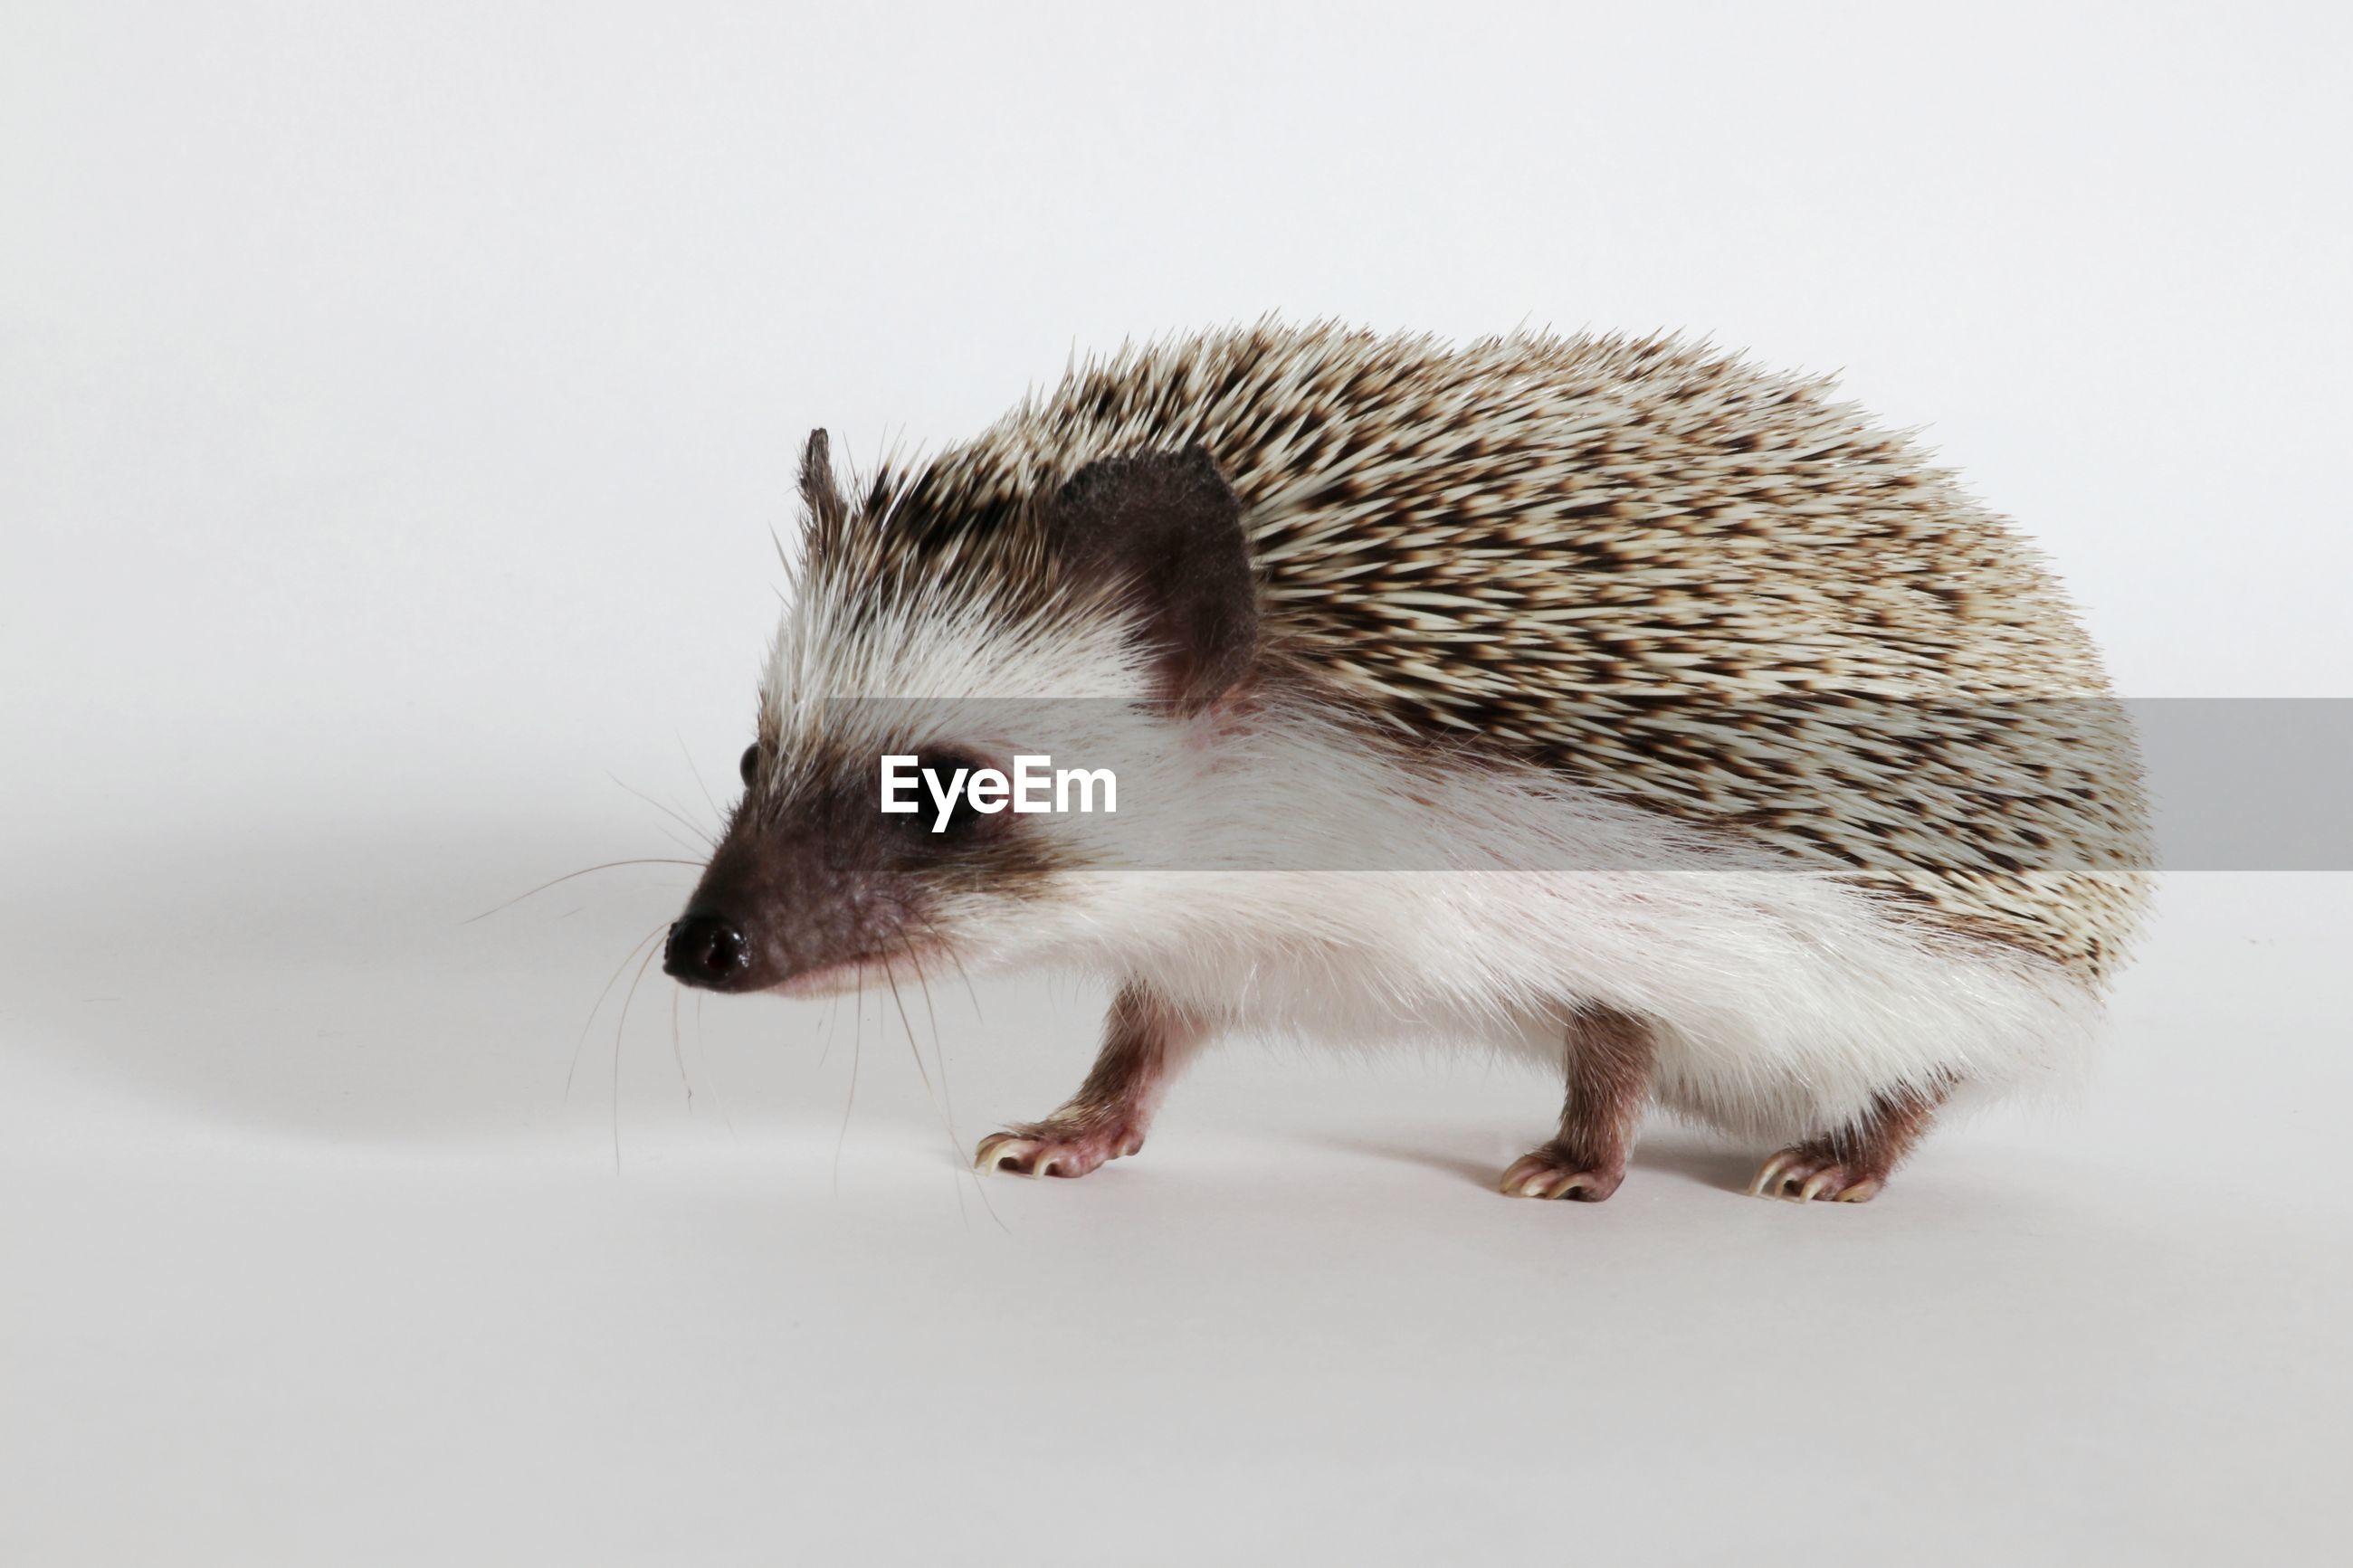 Close-up of a hedgehog over white background